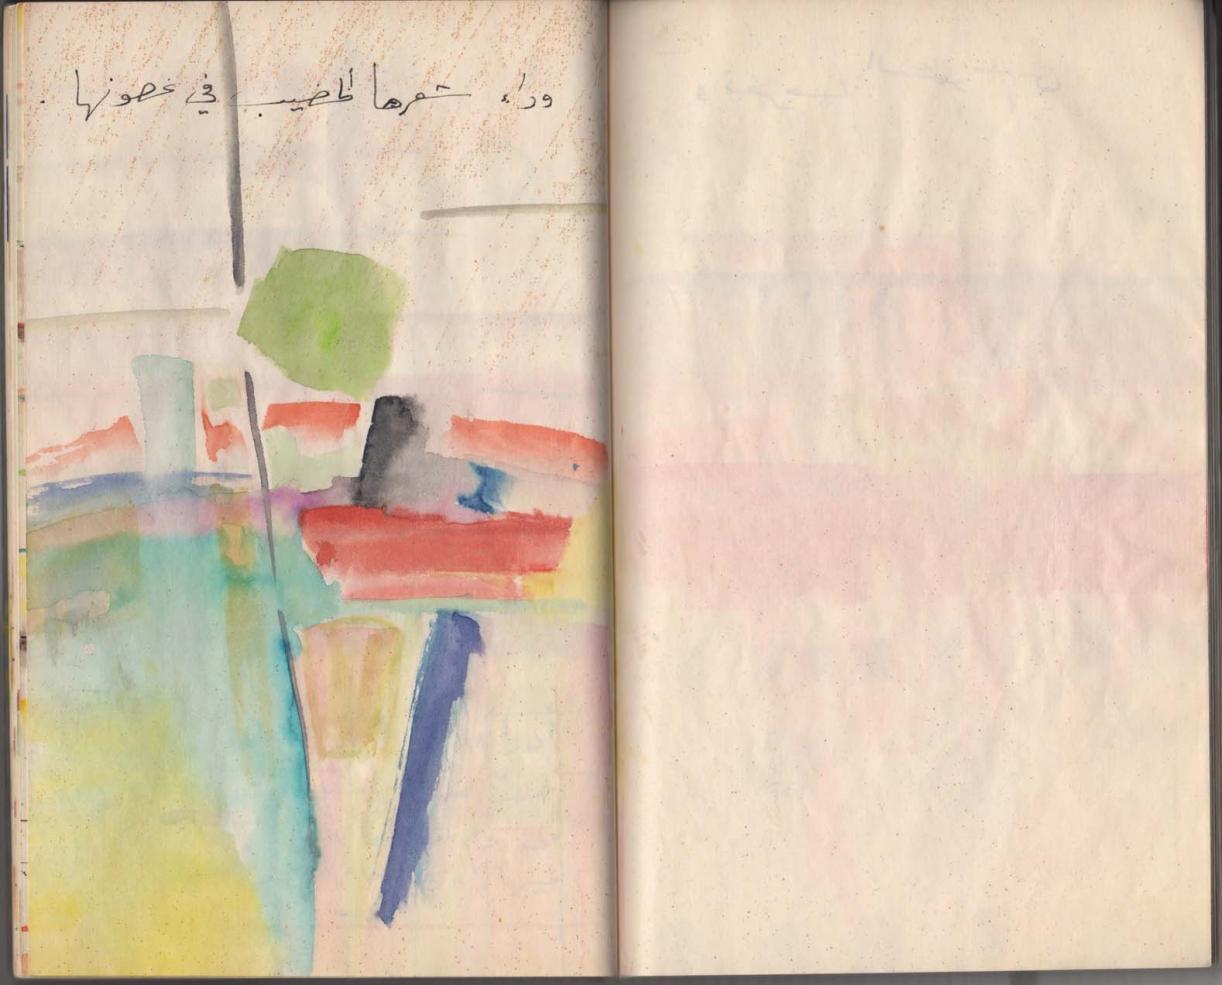 Madinat Al Sinbad, 1964, Manuscript, watercolor and pencil on paper, 60 pages, 23.5 x 16.2 each